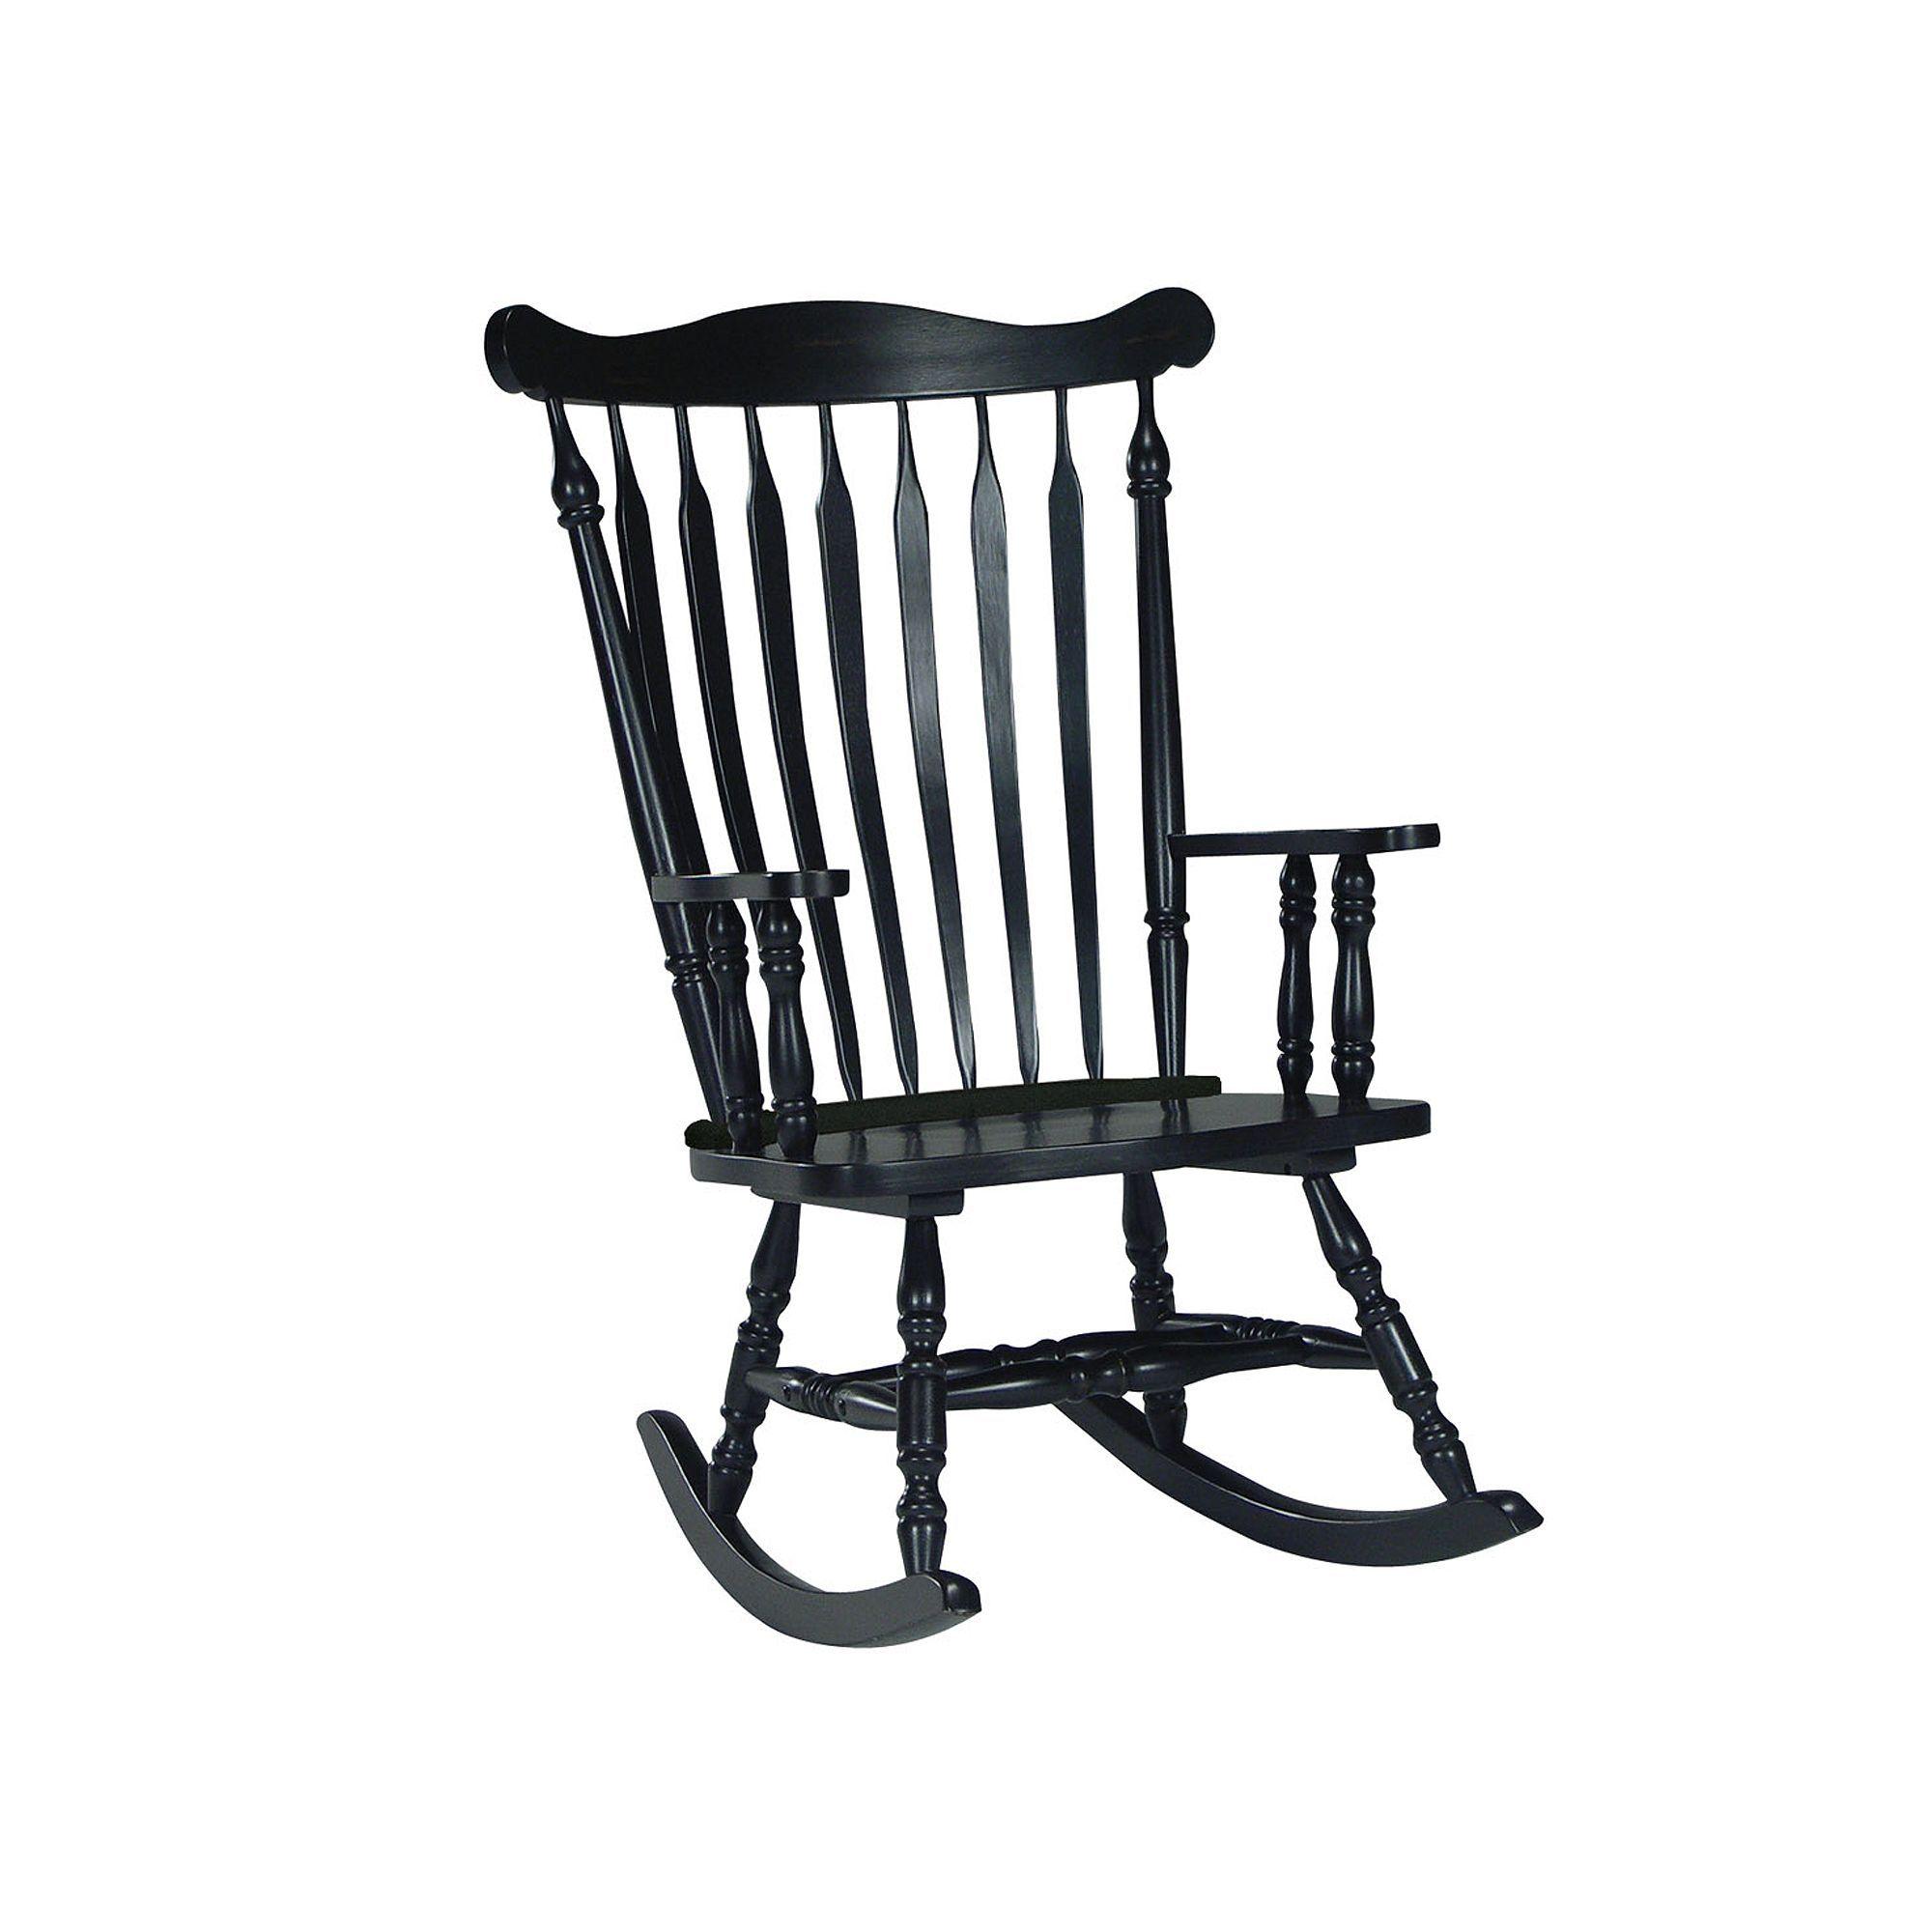 Outdoor Rocking Chair, Black Wood rocking chair, Rocking